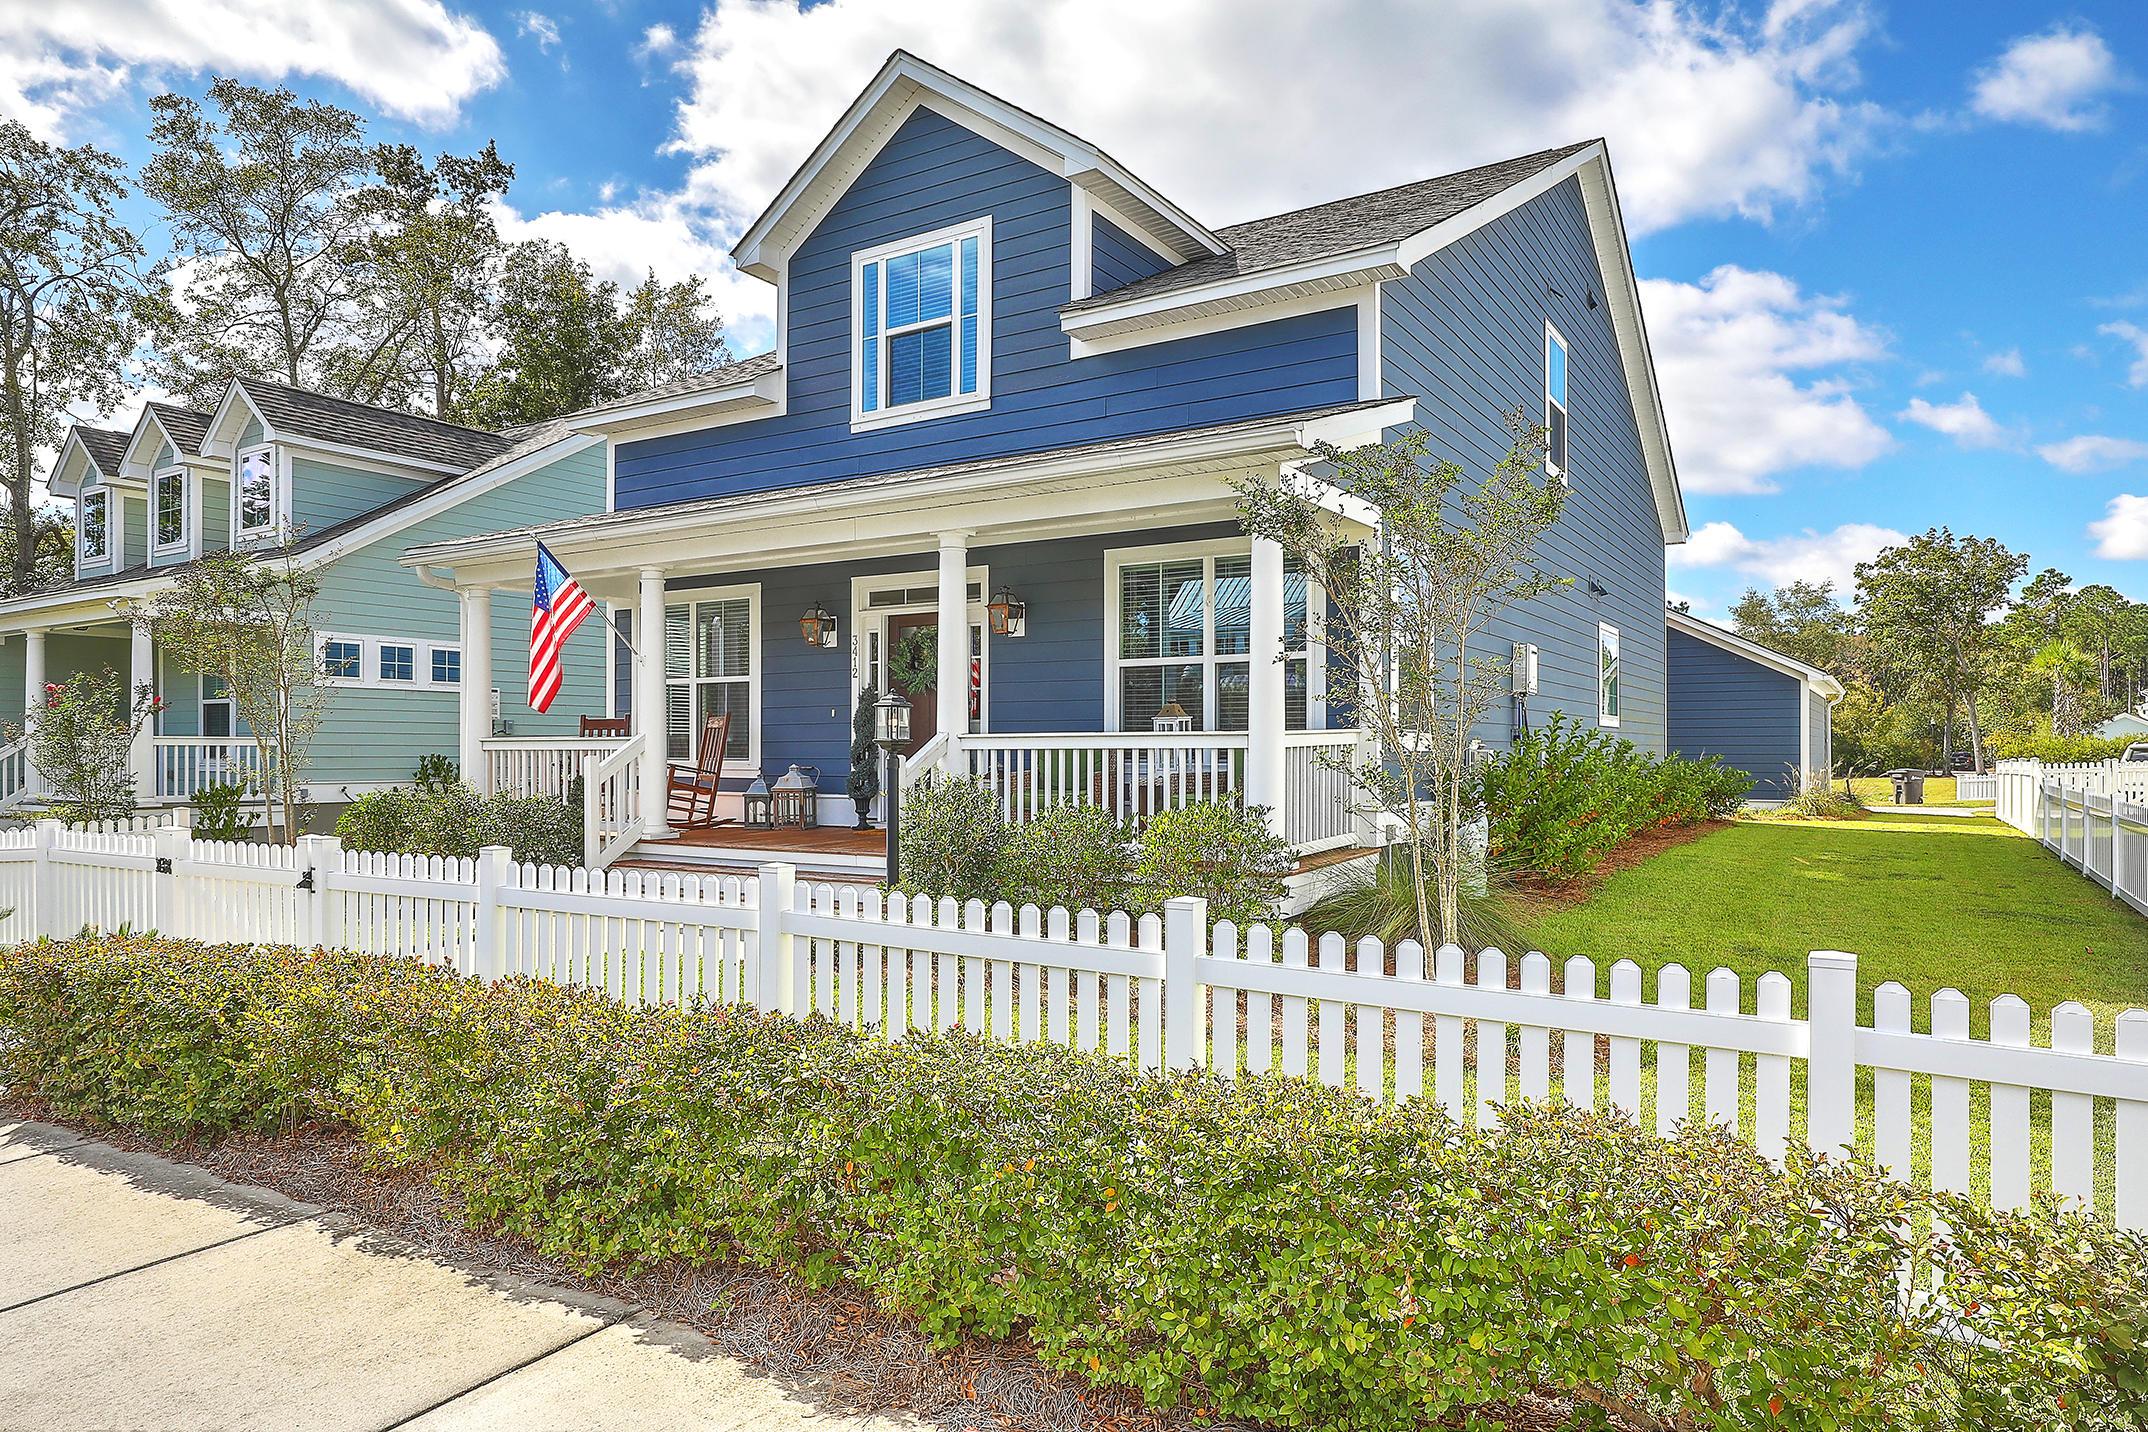 Park West Homes For Sale - 3412 Salterbeck, Mount Pleasant, SC - 1